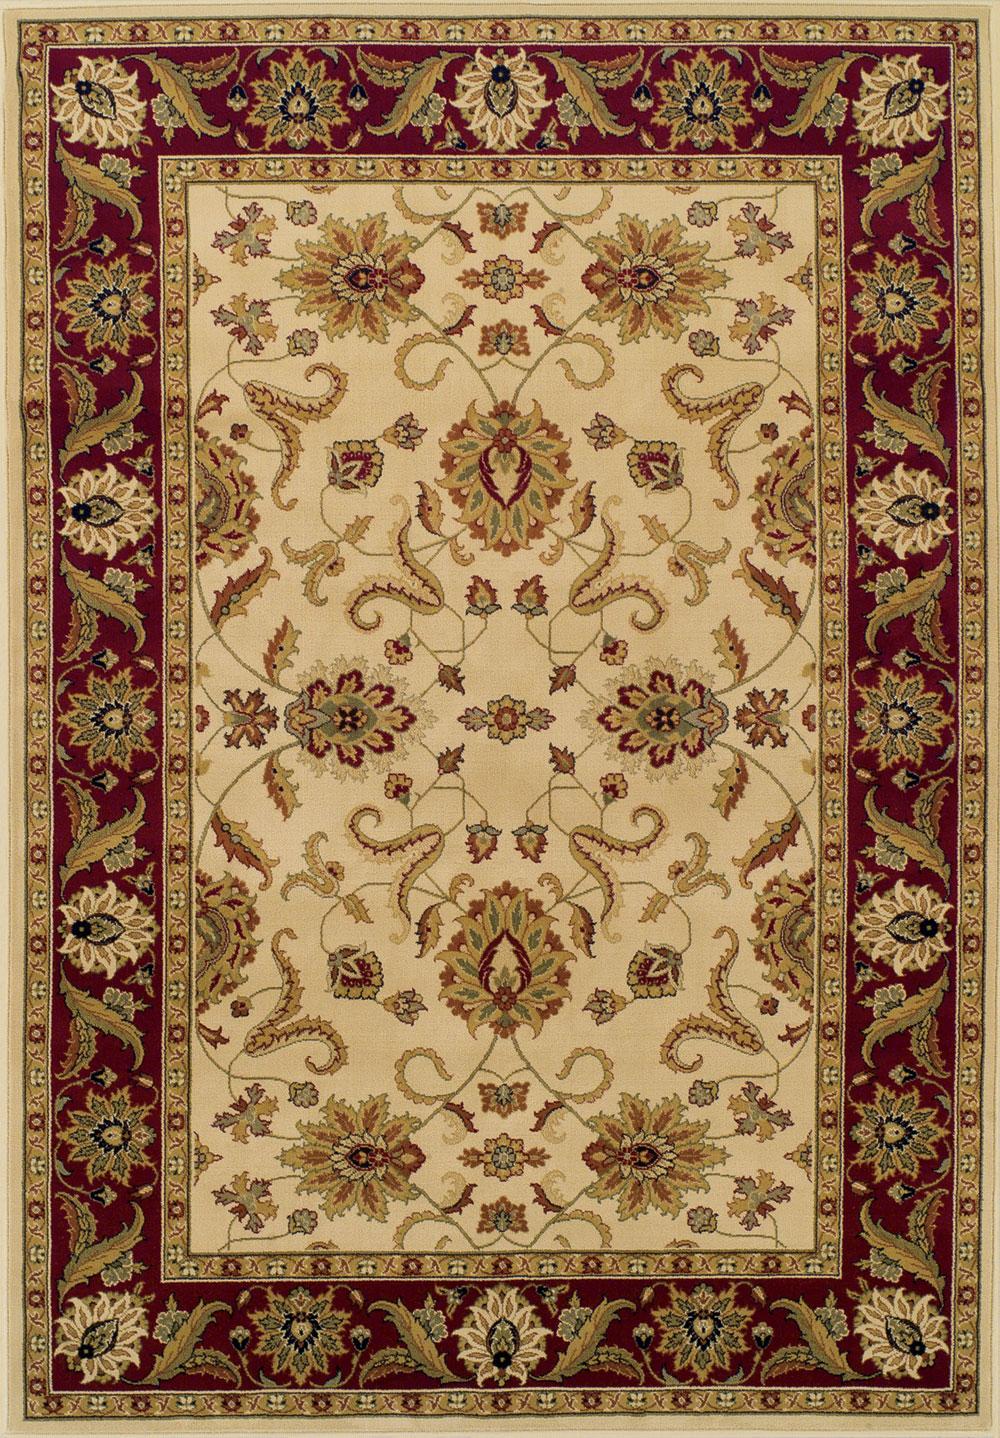 96x132 rug